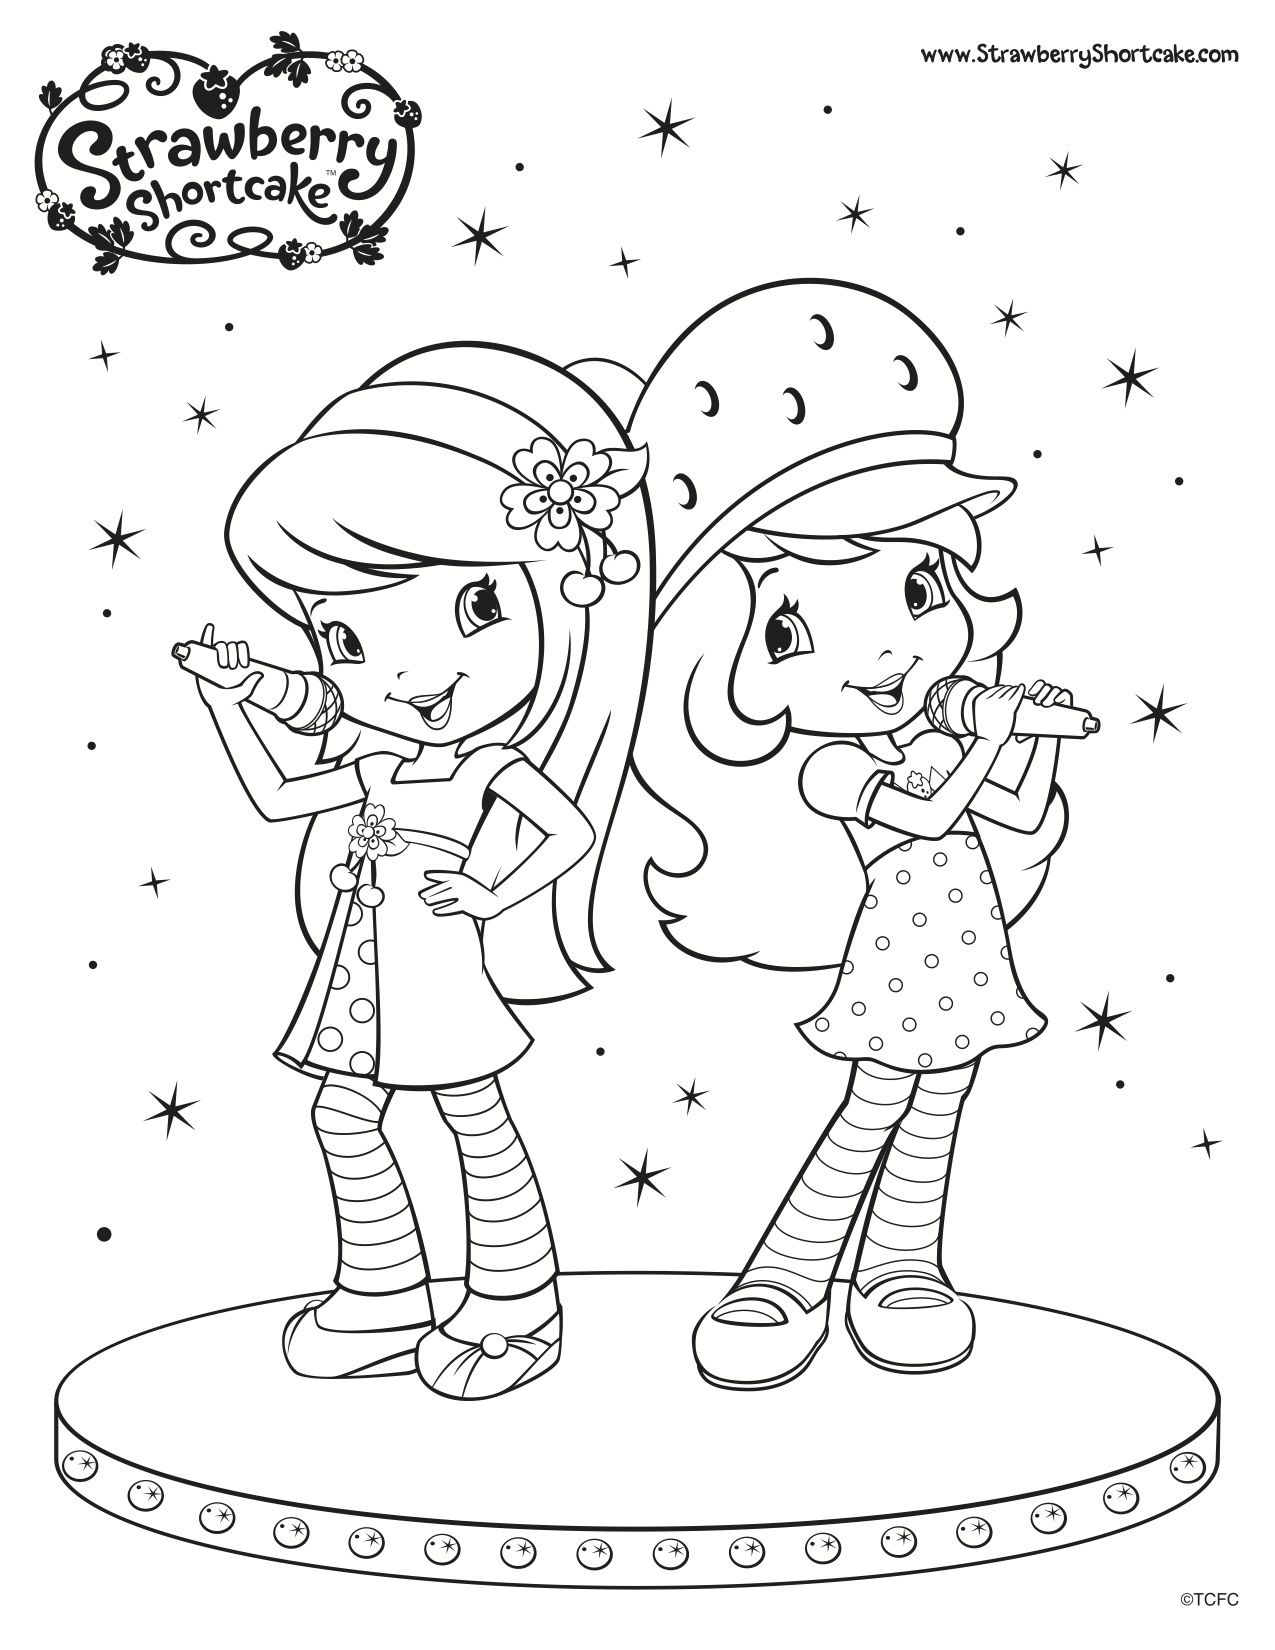 strawberry shortcake coloring pages - Pesquisa Google | Dâu Tây ...